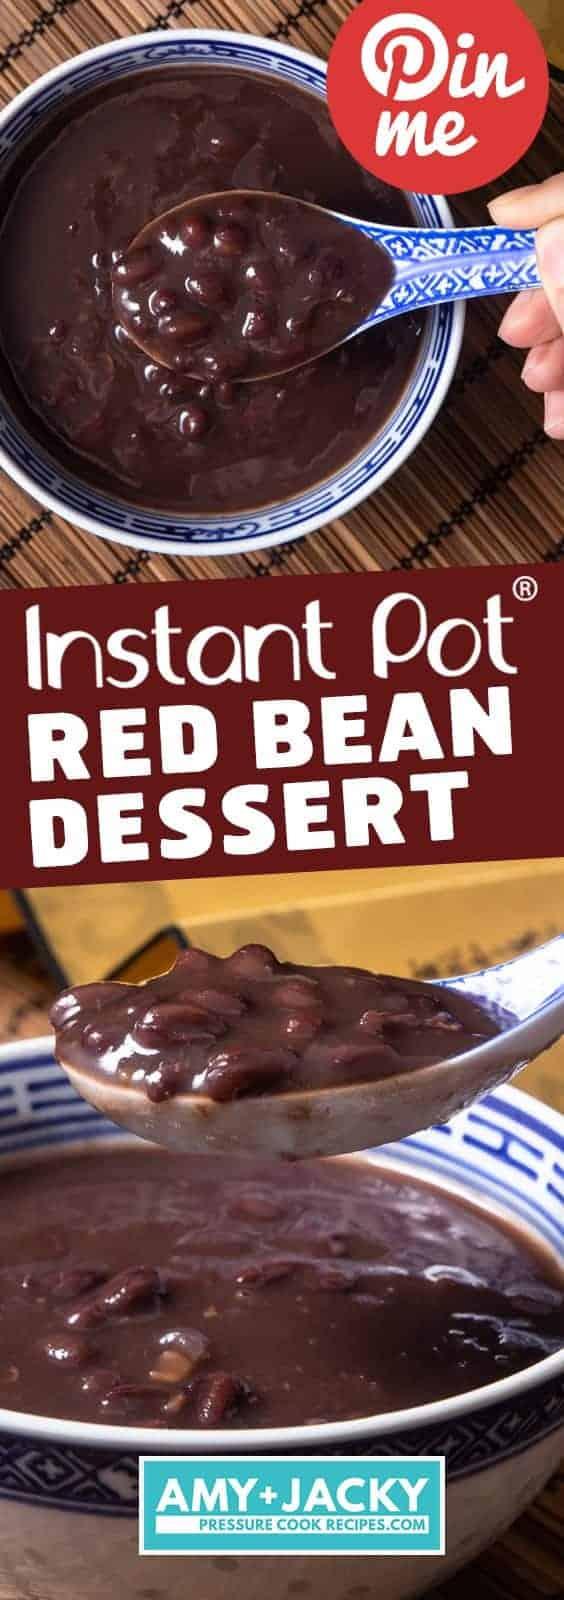 Instant Pot Red Bean Soup | Pressure Cooker Red Bean Soup | 紅豆沙 | 紅豆湯 | 糖水 | 壓力鍋食譜 | Instant Pot Chinese Recipes | Instant Pot Desserts | Instant Pot Recipes #instantpot #recipes #chinese #dessert #easy #sweet